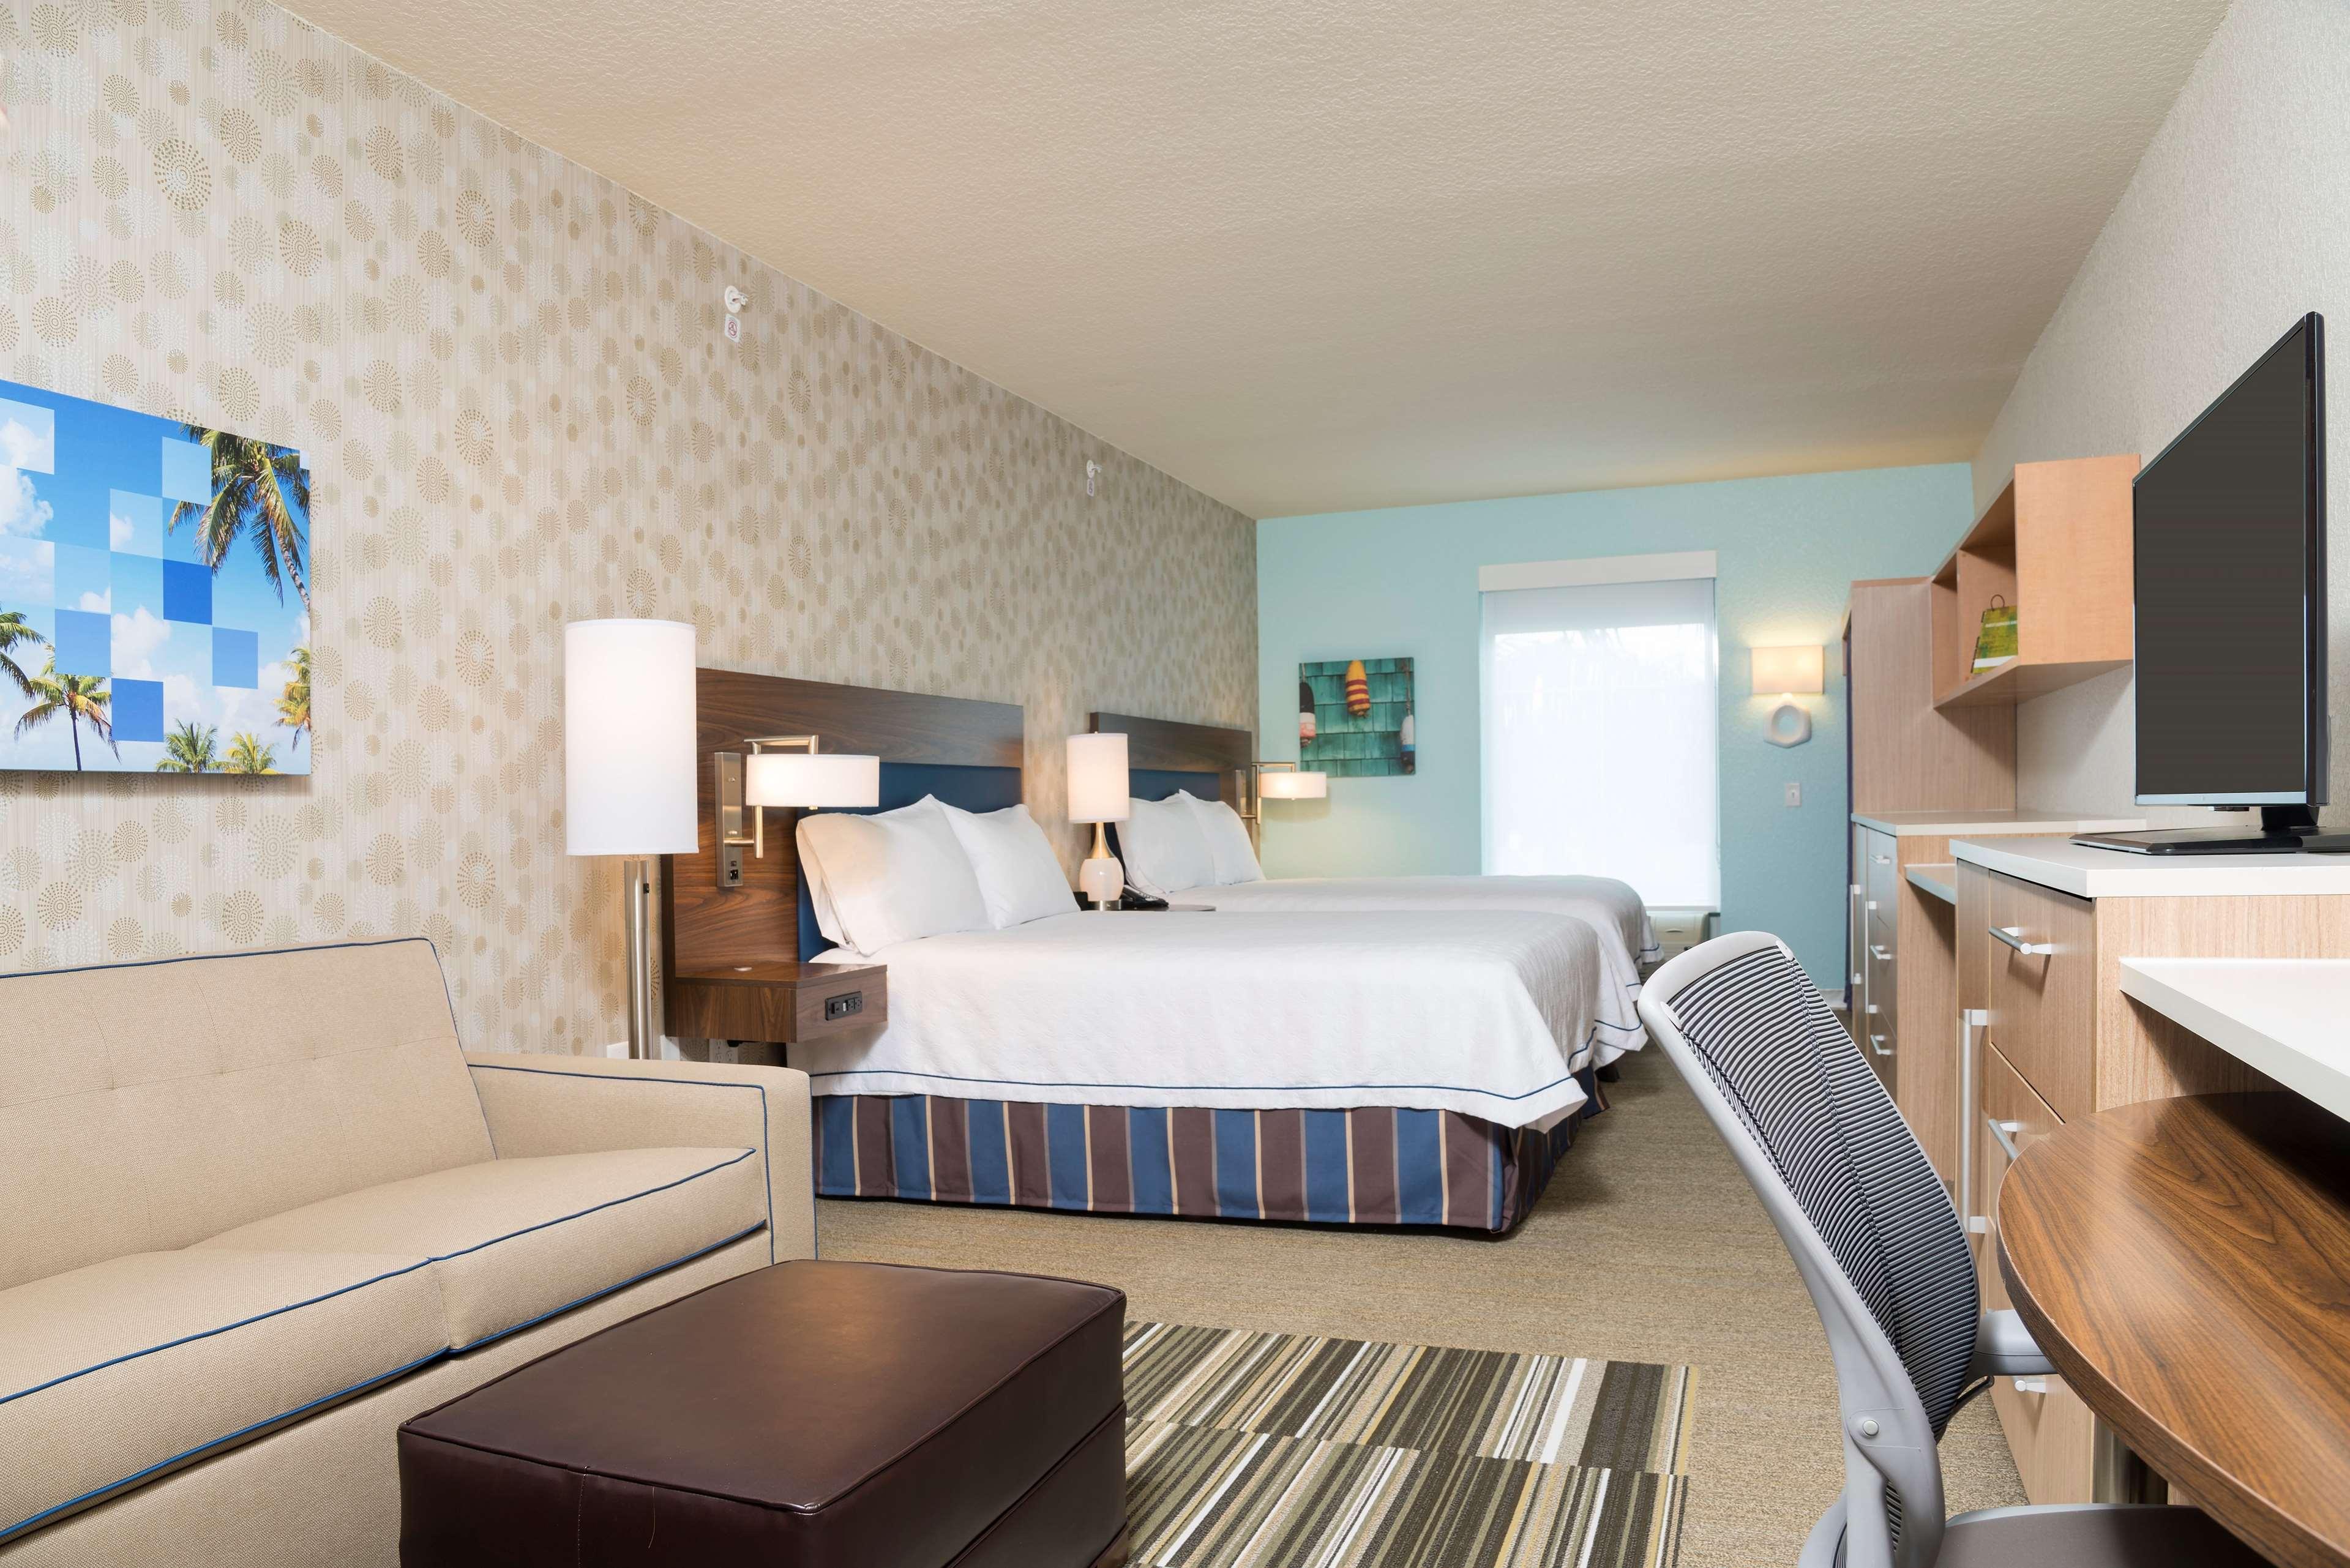 Home2 Suites by Hilton Nokomis Sarasota Casey Key image 16